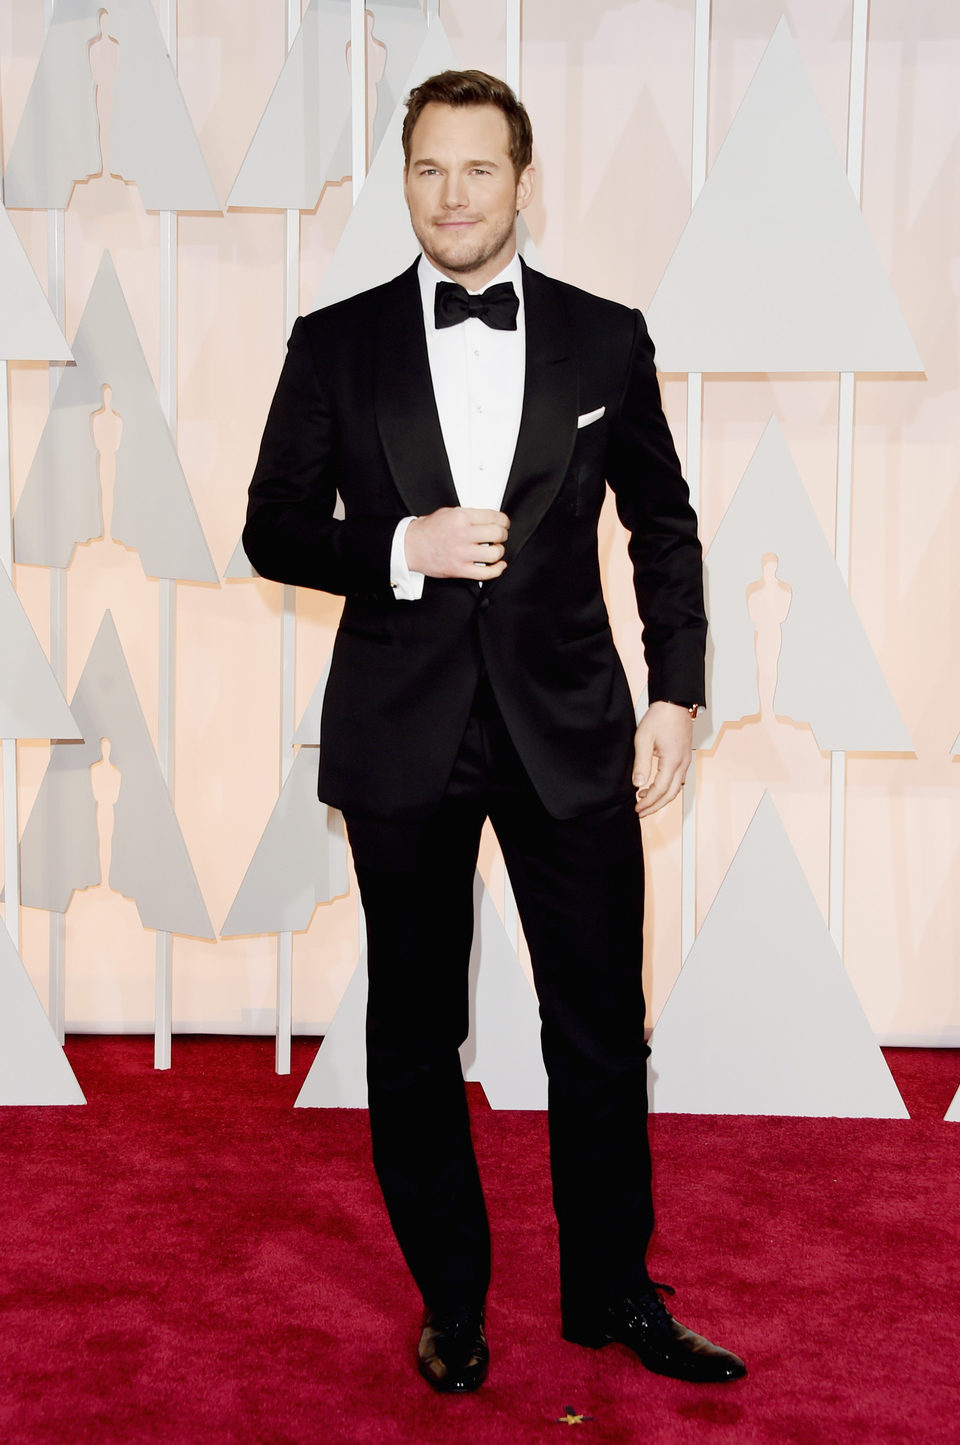 Chris Pratt en la alfombra roja de los Oscar 2015